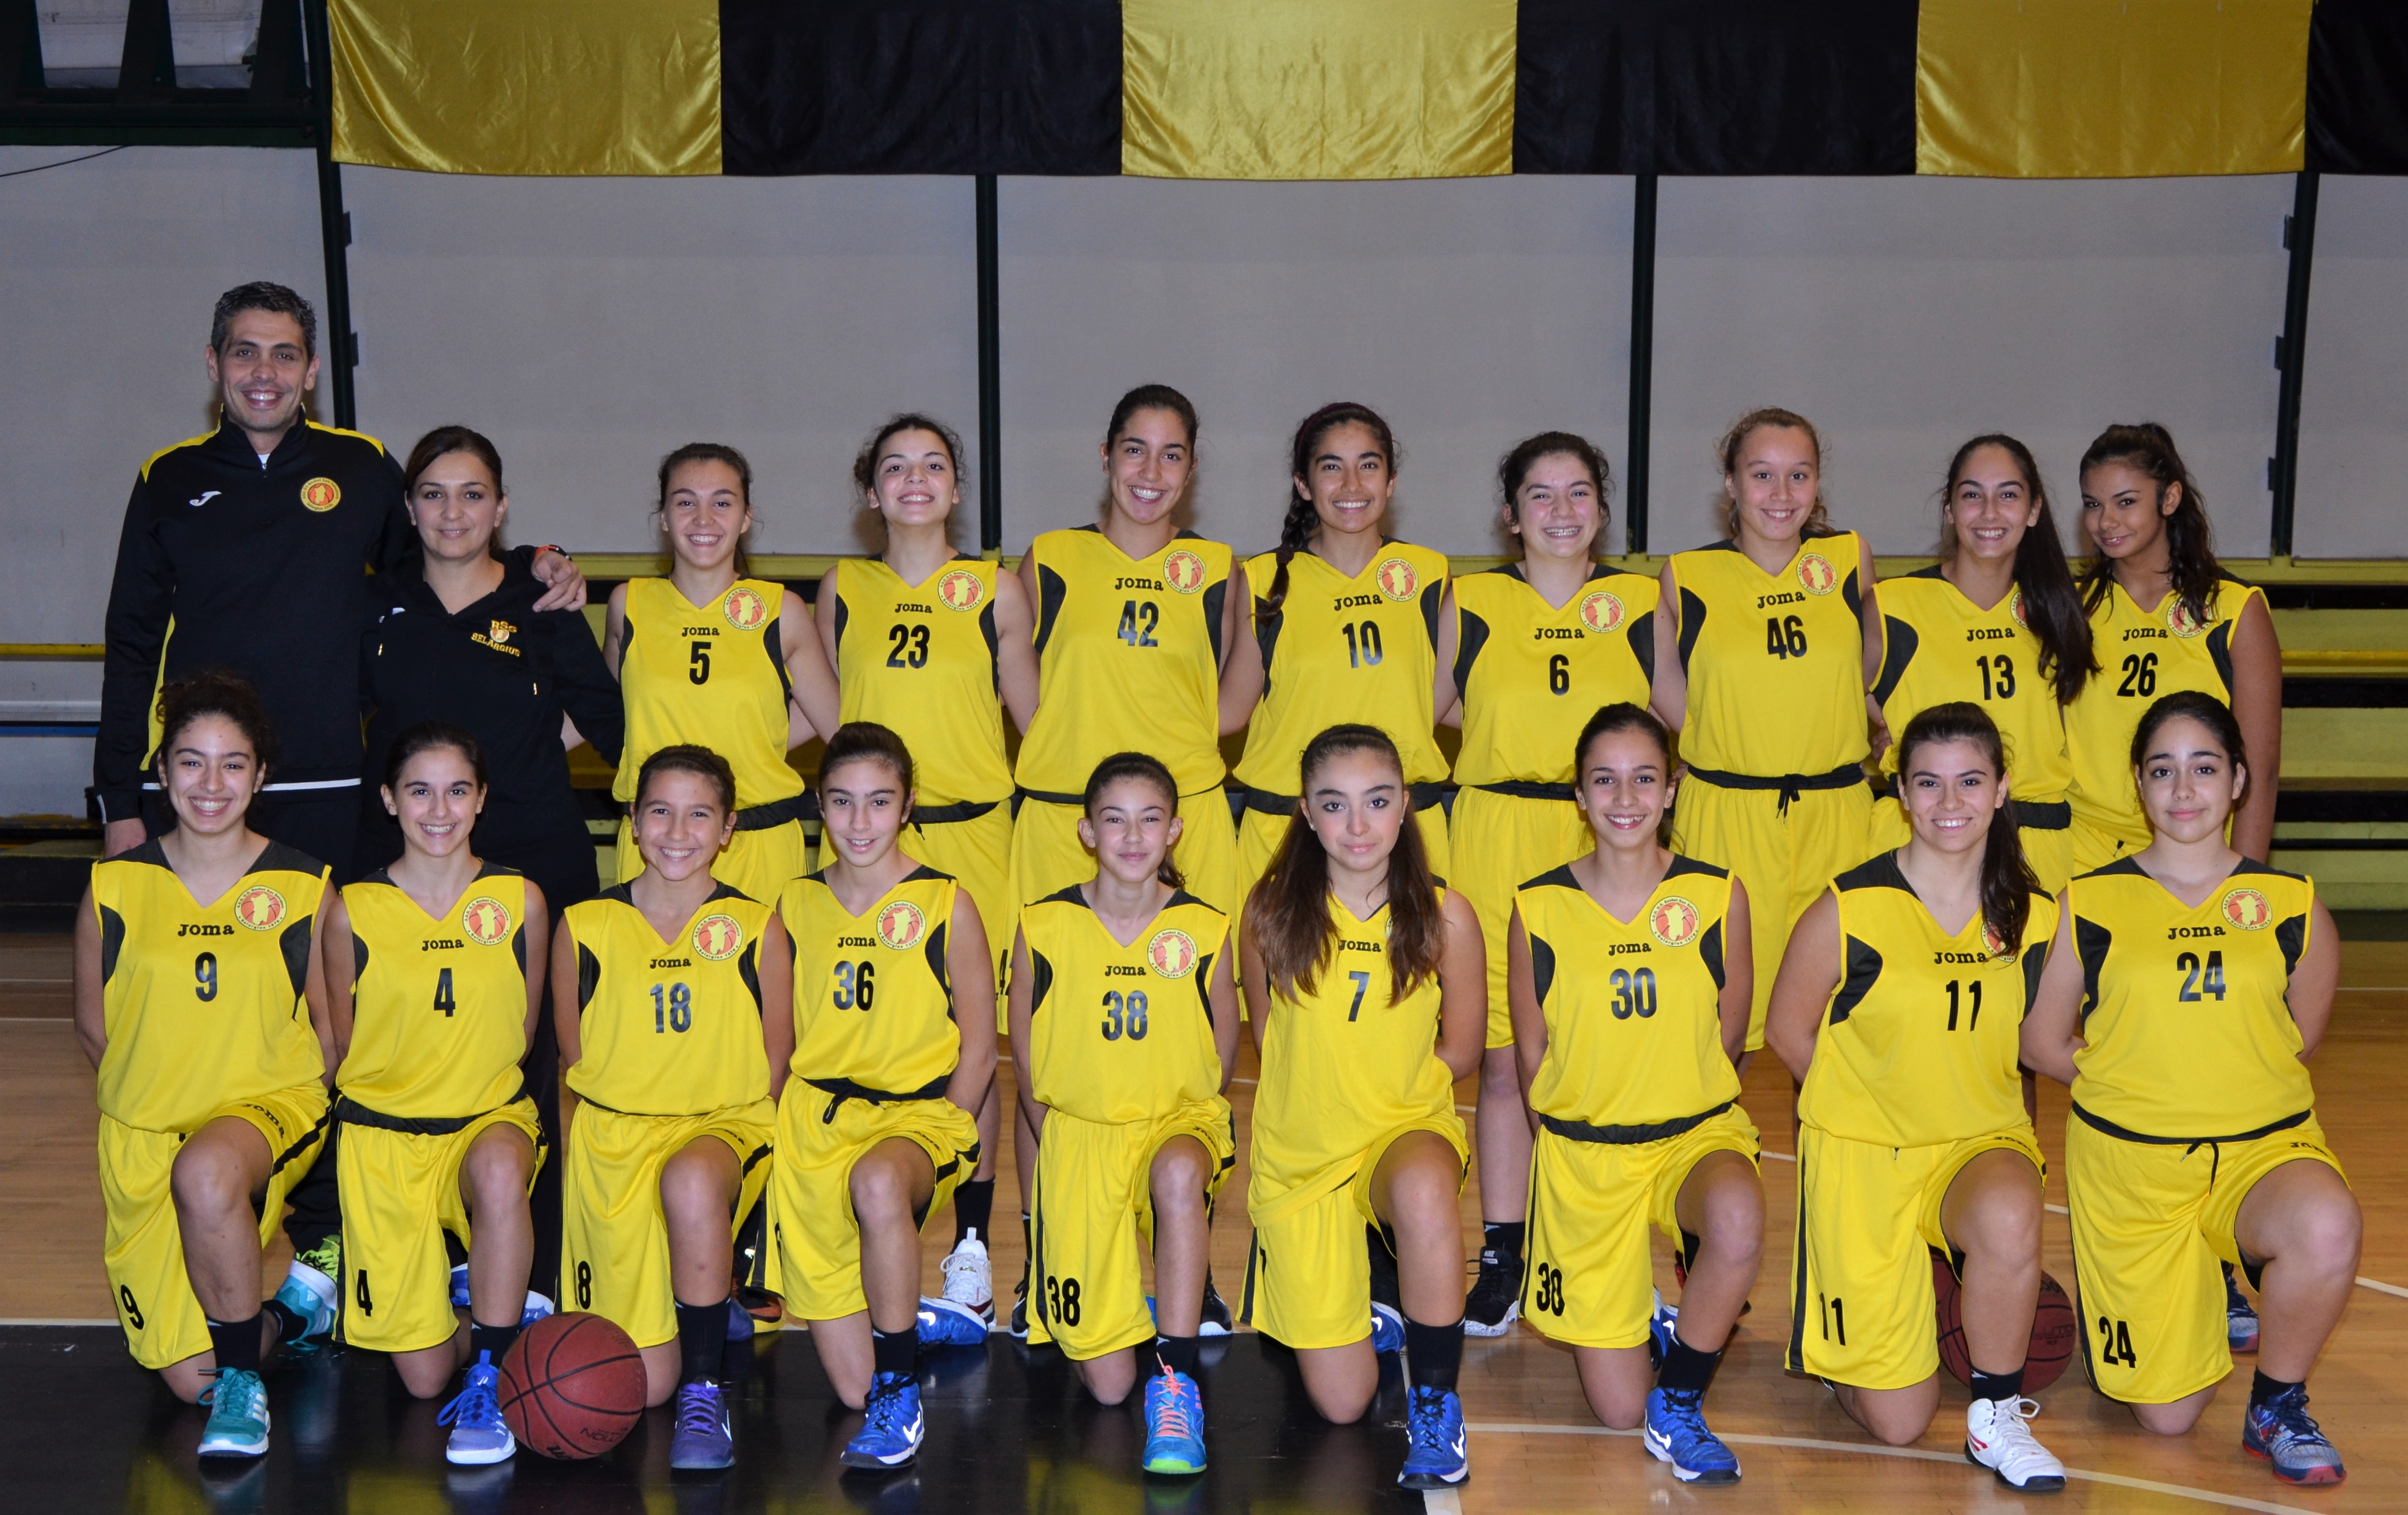 squadra-giallo-dsc_9574